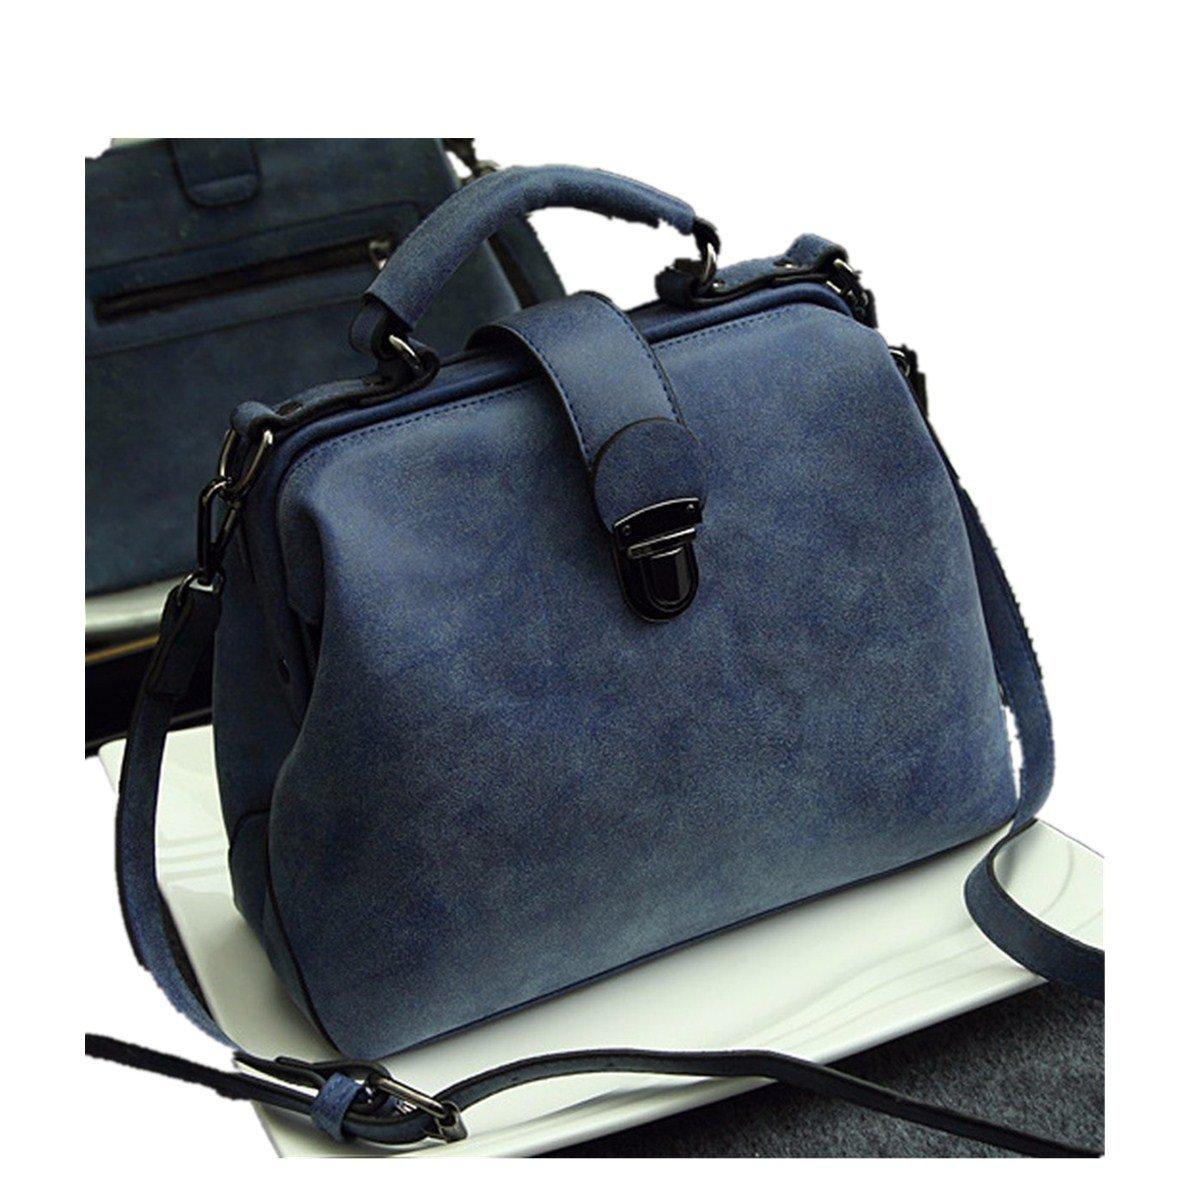 OURBAG Hot Retro Doctor Bag Fashion Trend Diagonal Portable Shoulder Bag Blue Medium